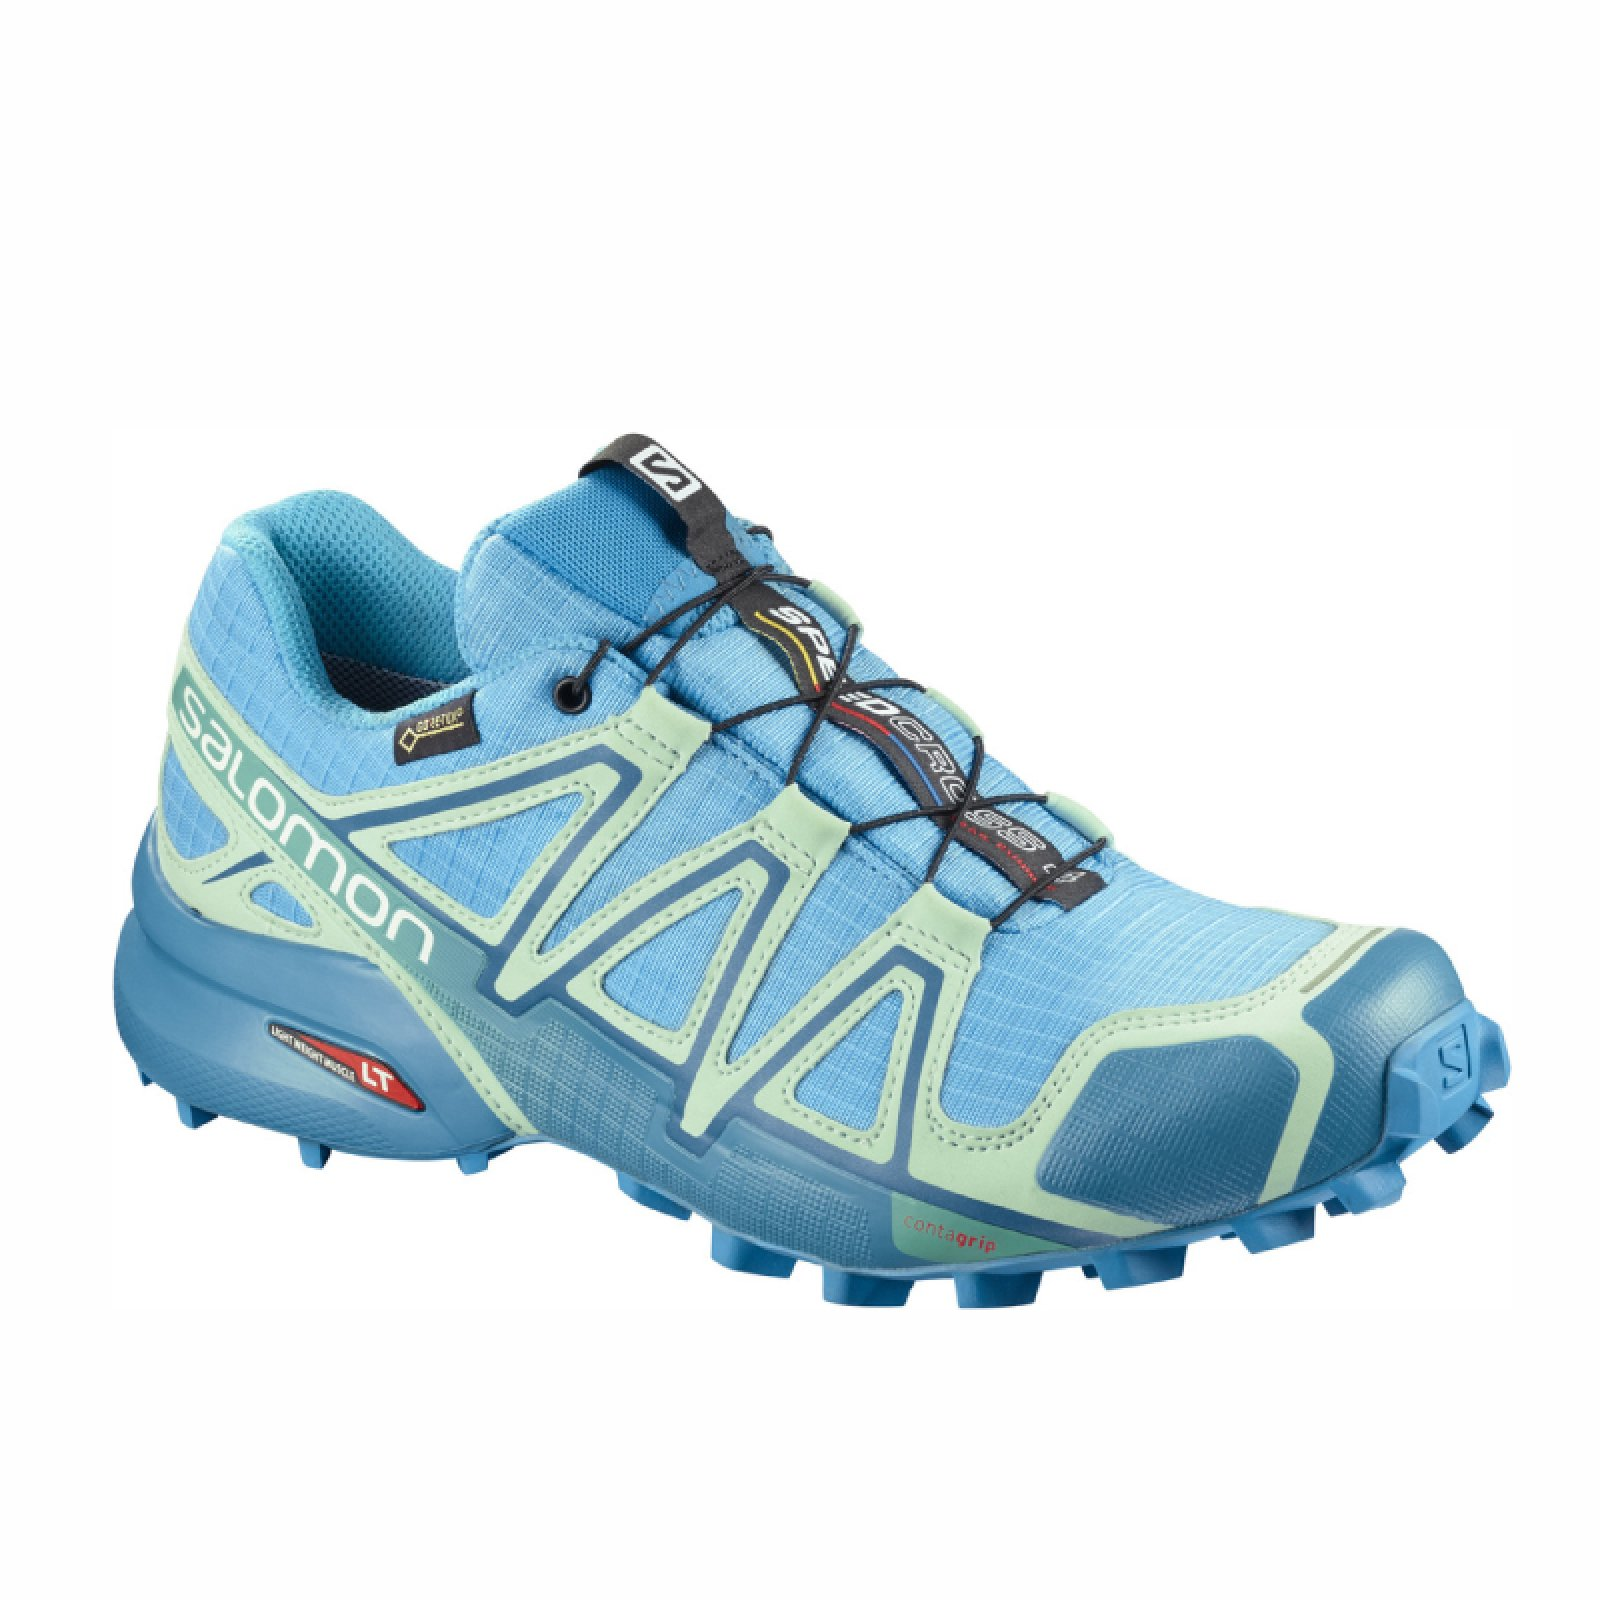 db85e3d7910 Trailové běžecké boty Salomon Speedcross 4 GTX W L40099900 ...